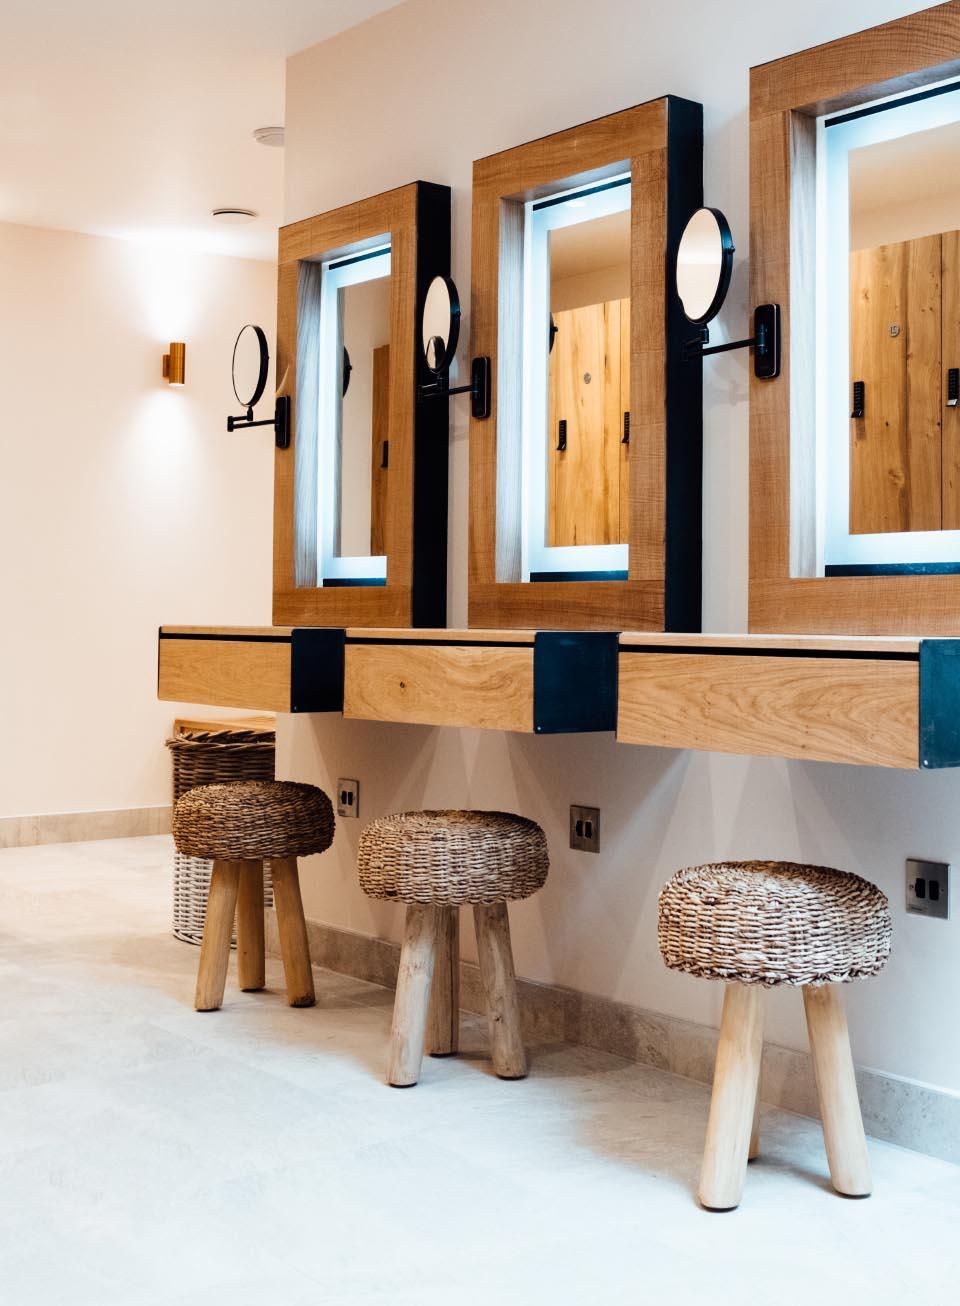 Silverlake-Dorset-Spa-Designers-Vanity-units